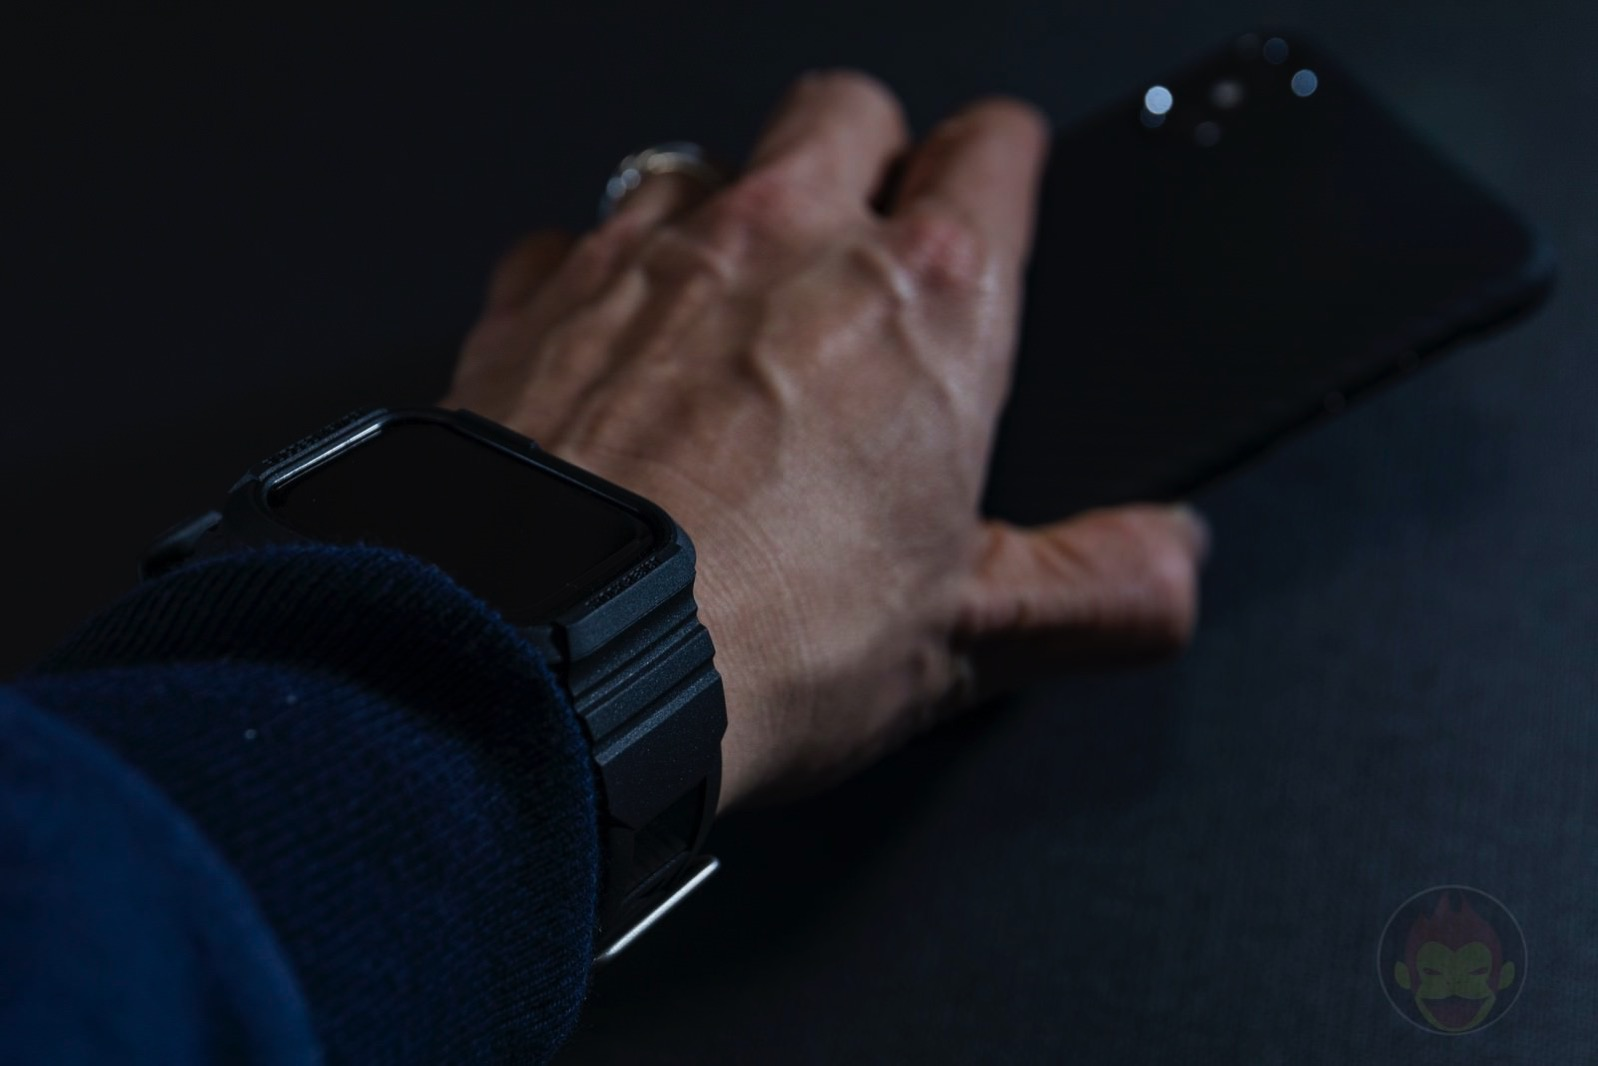 Spigen-Rugged-Armor-Pro-Apple-Watch-Band-and-case-16.jpg